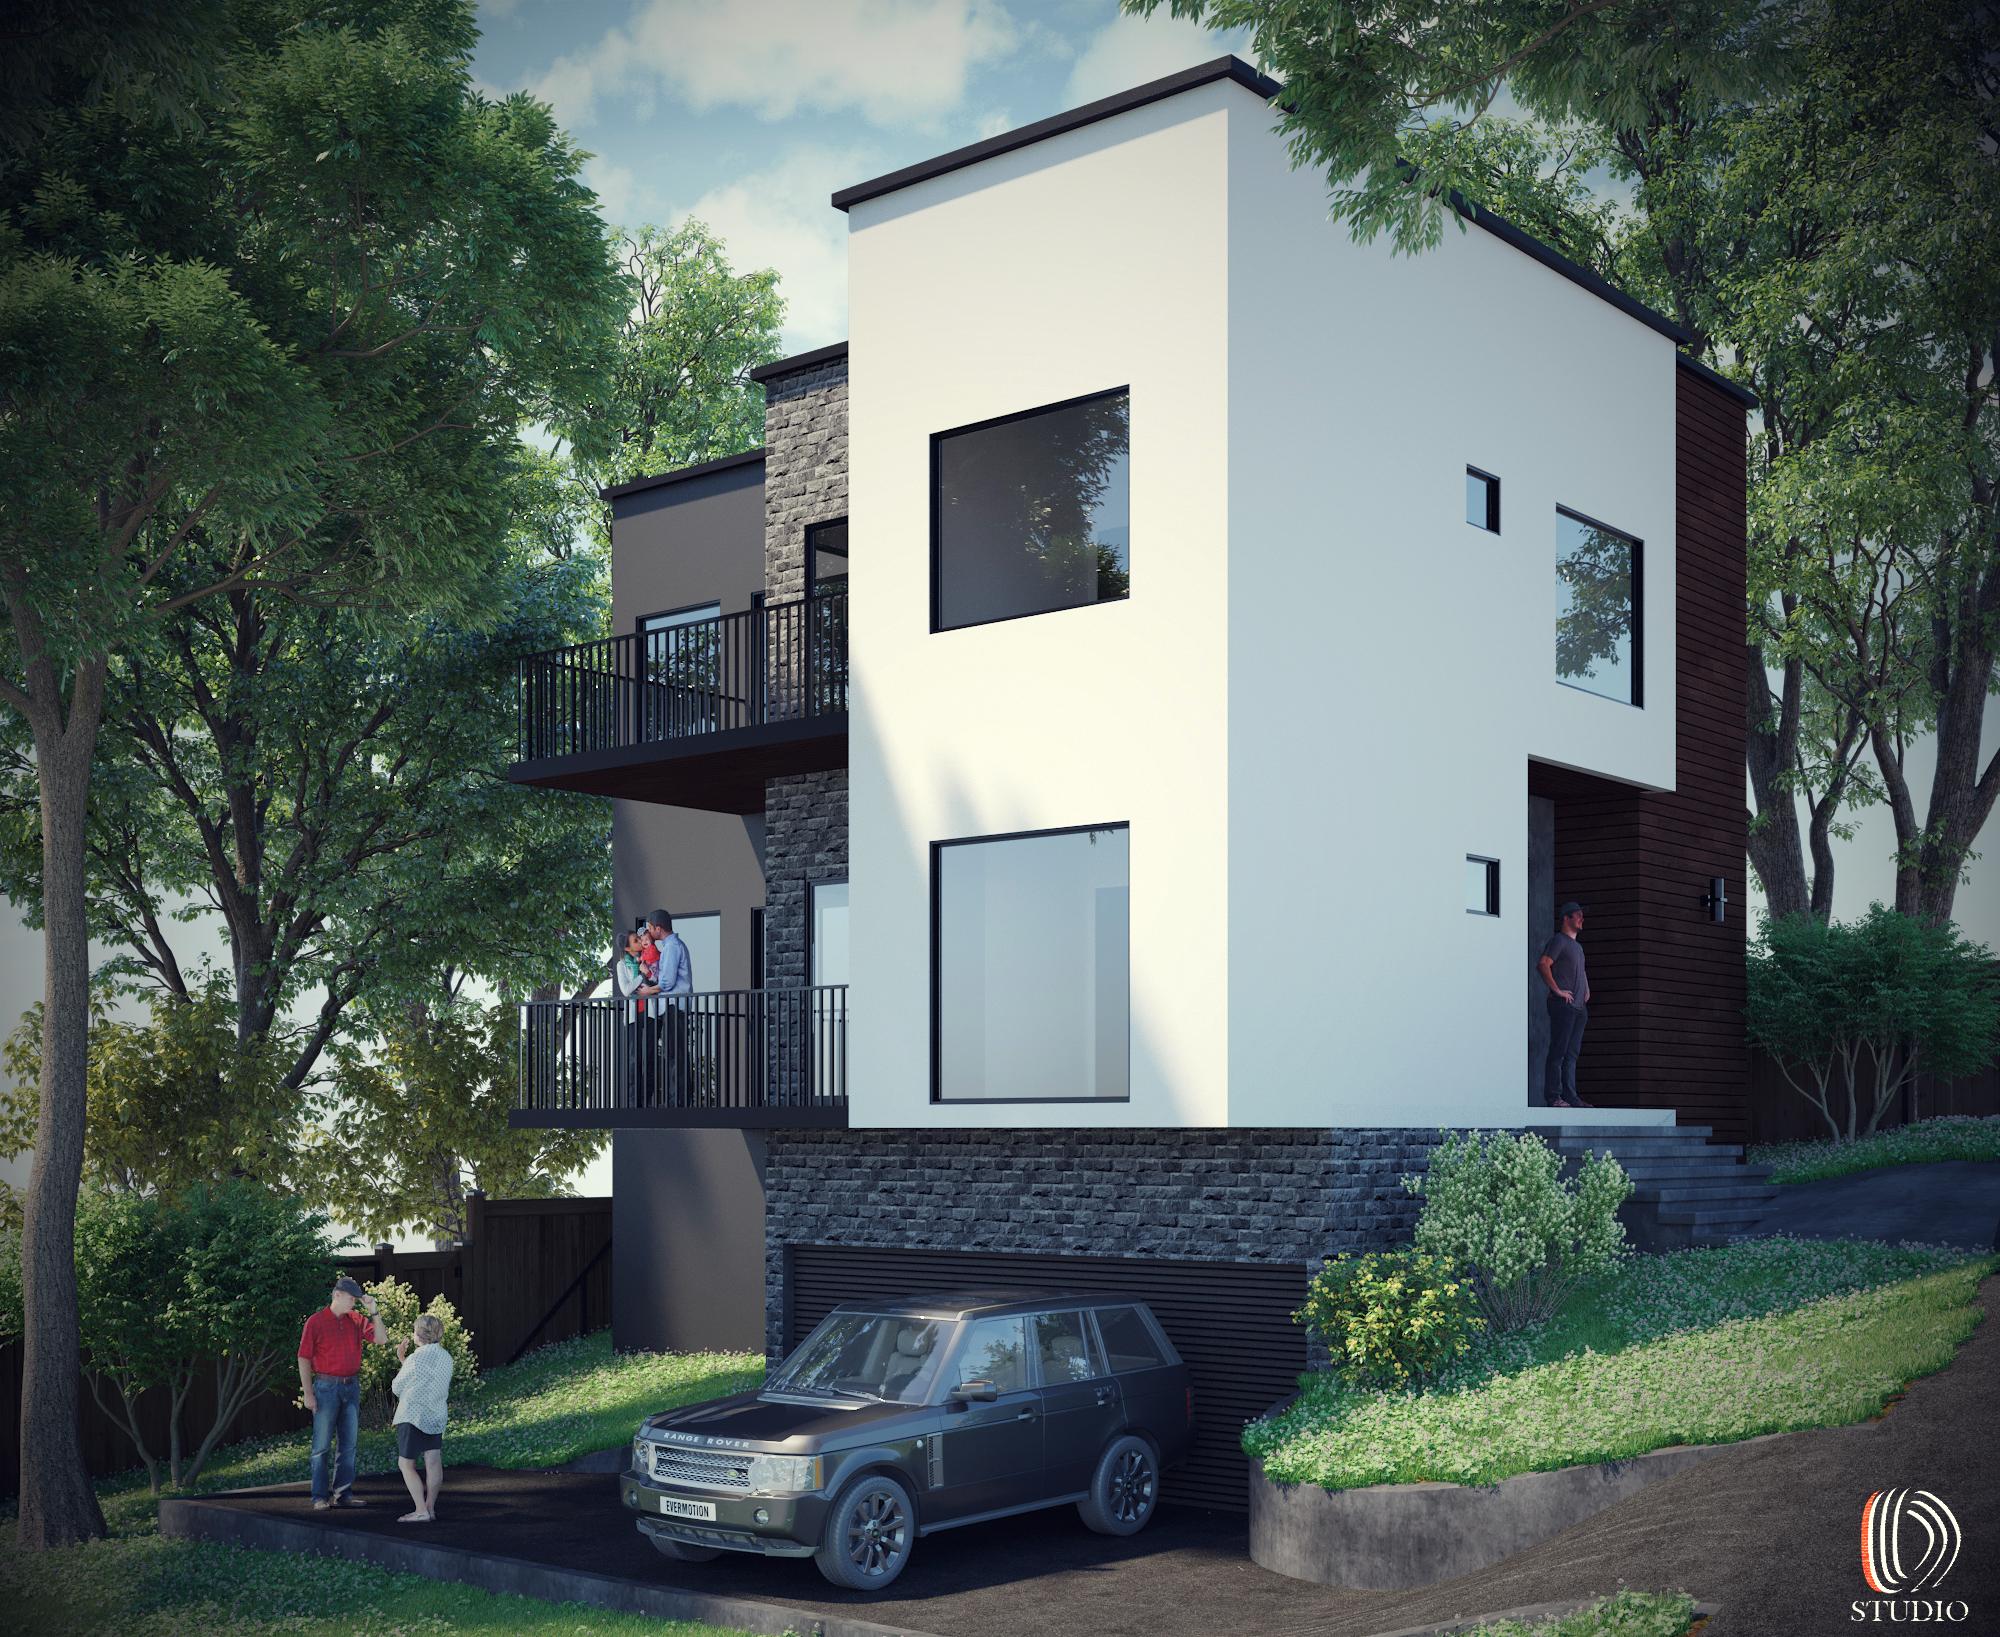 848-01-Exterior House